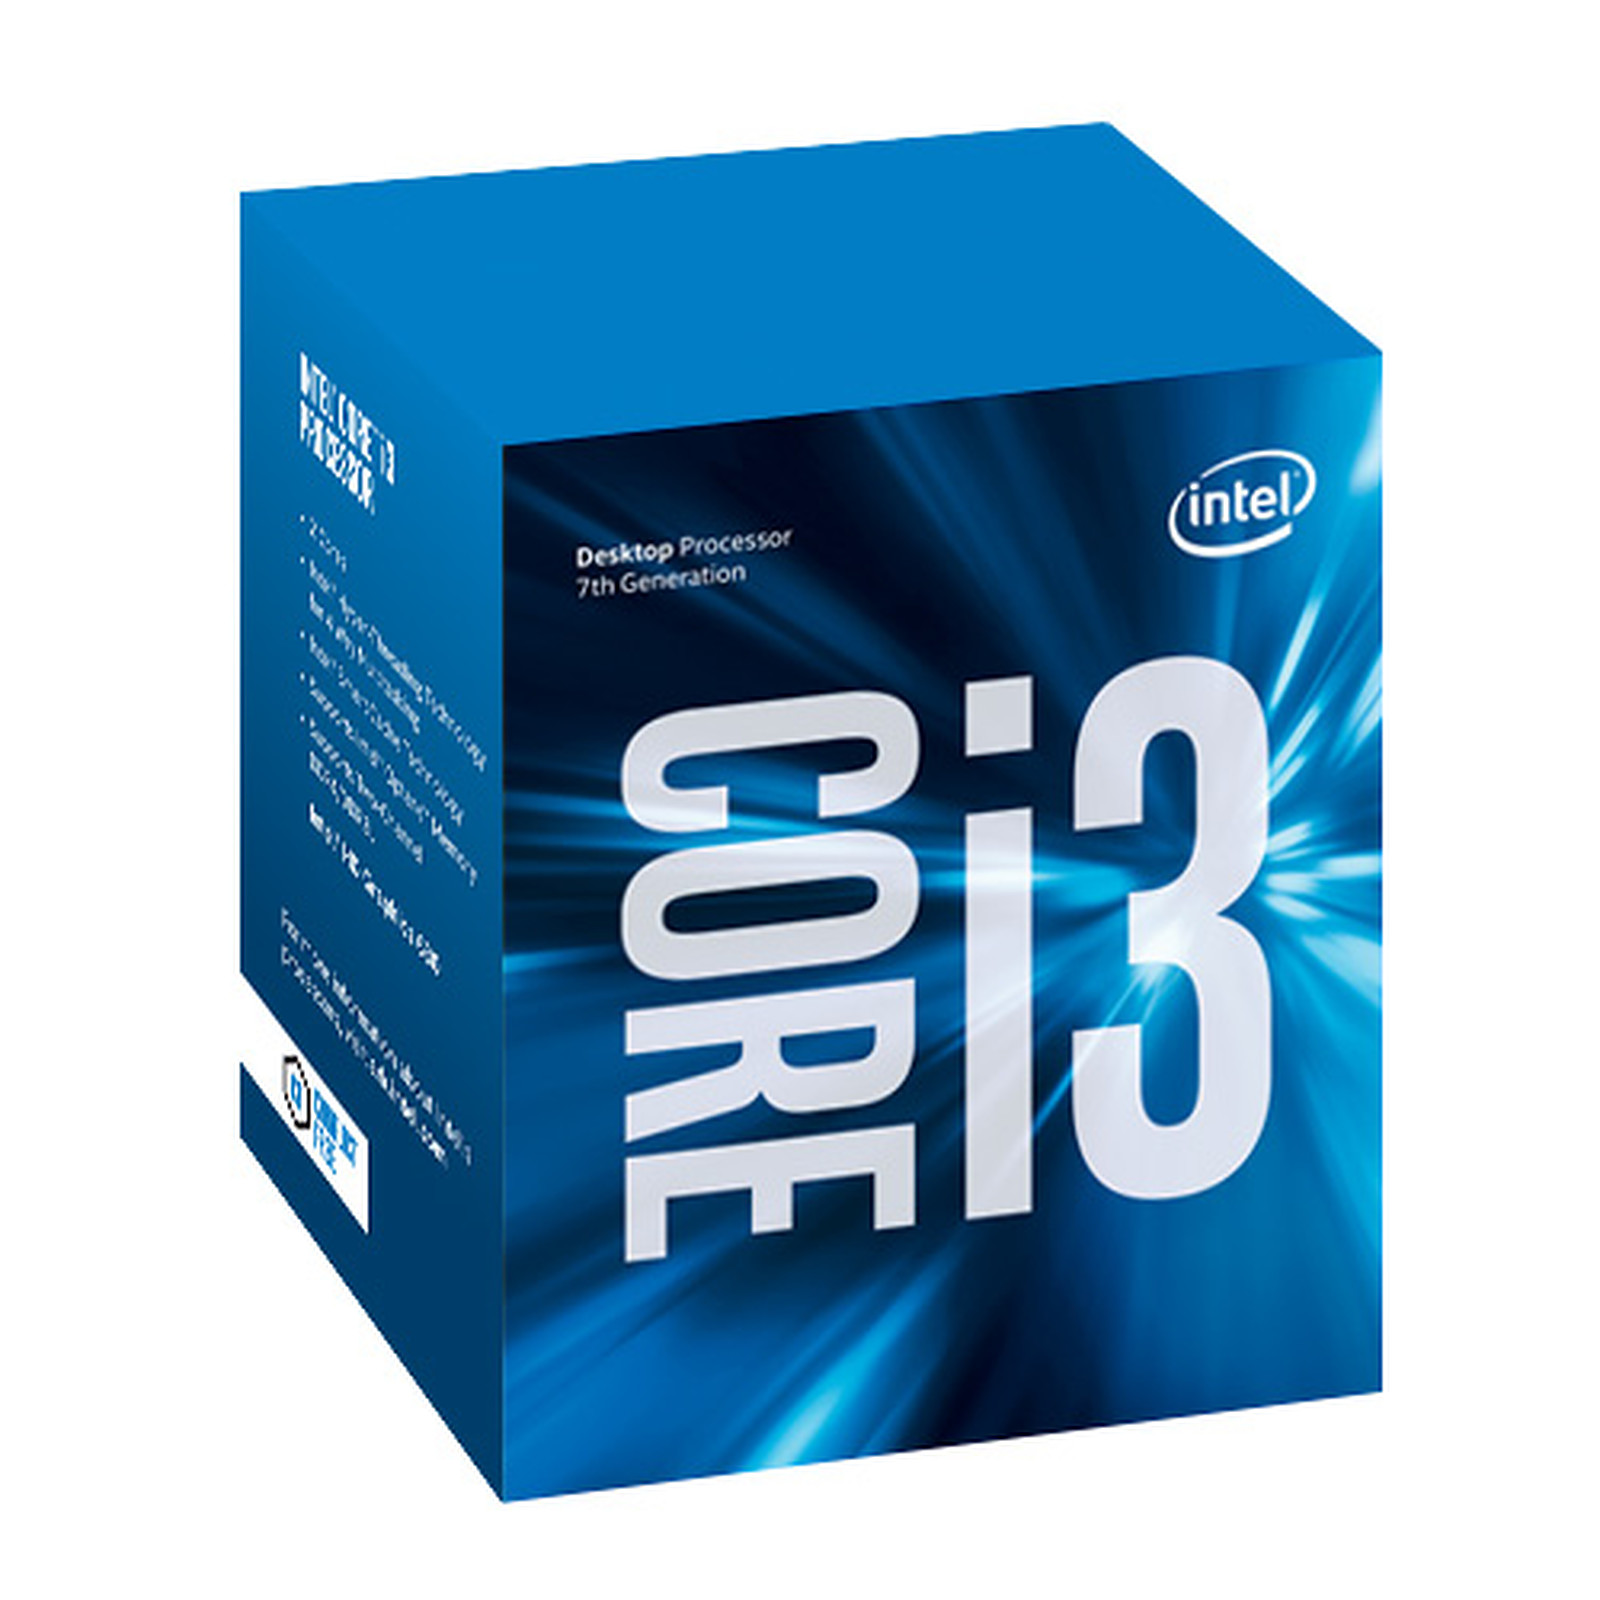 Intel Core i3-7300 (4.0 GHz)